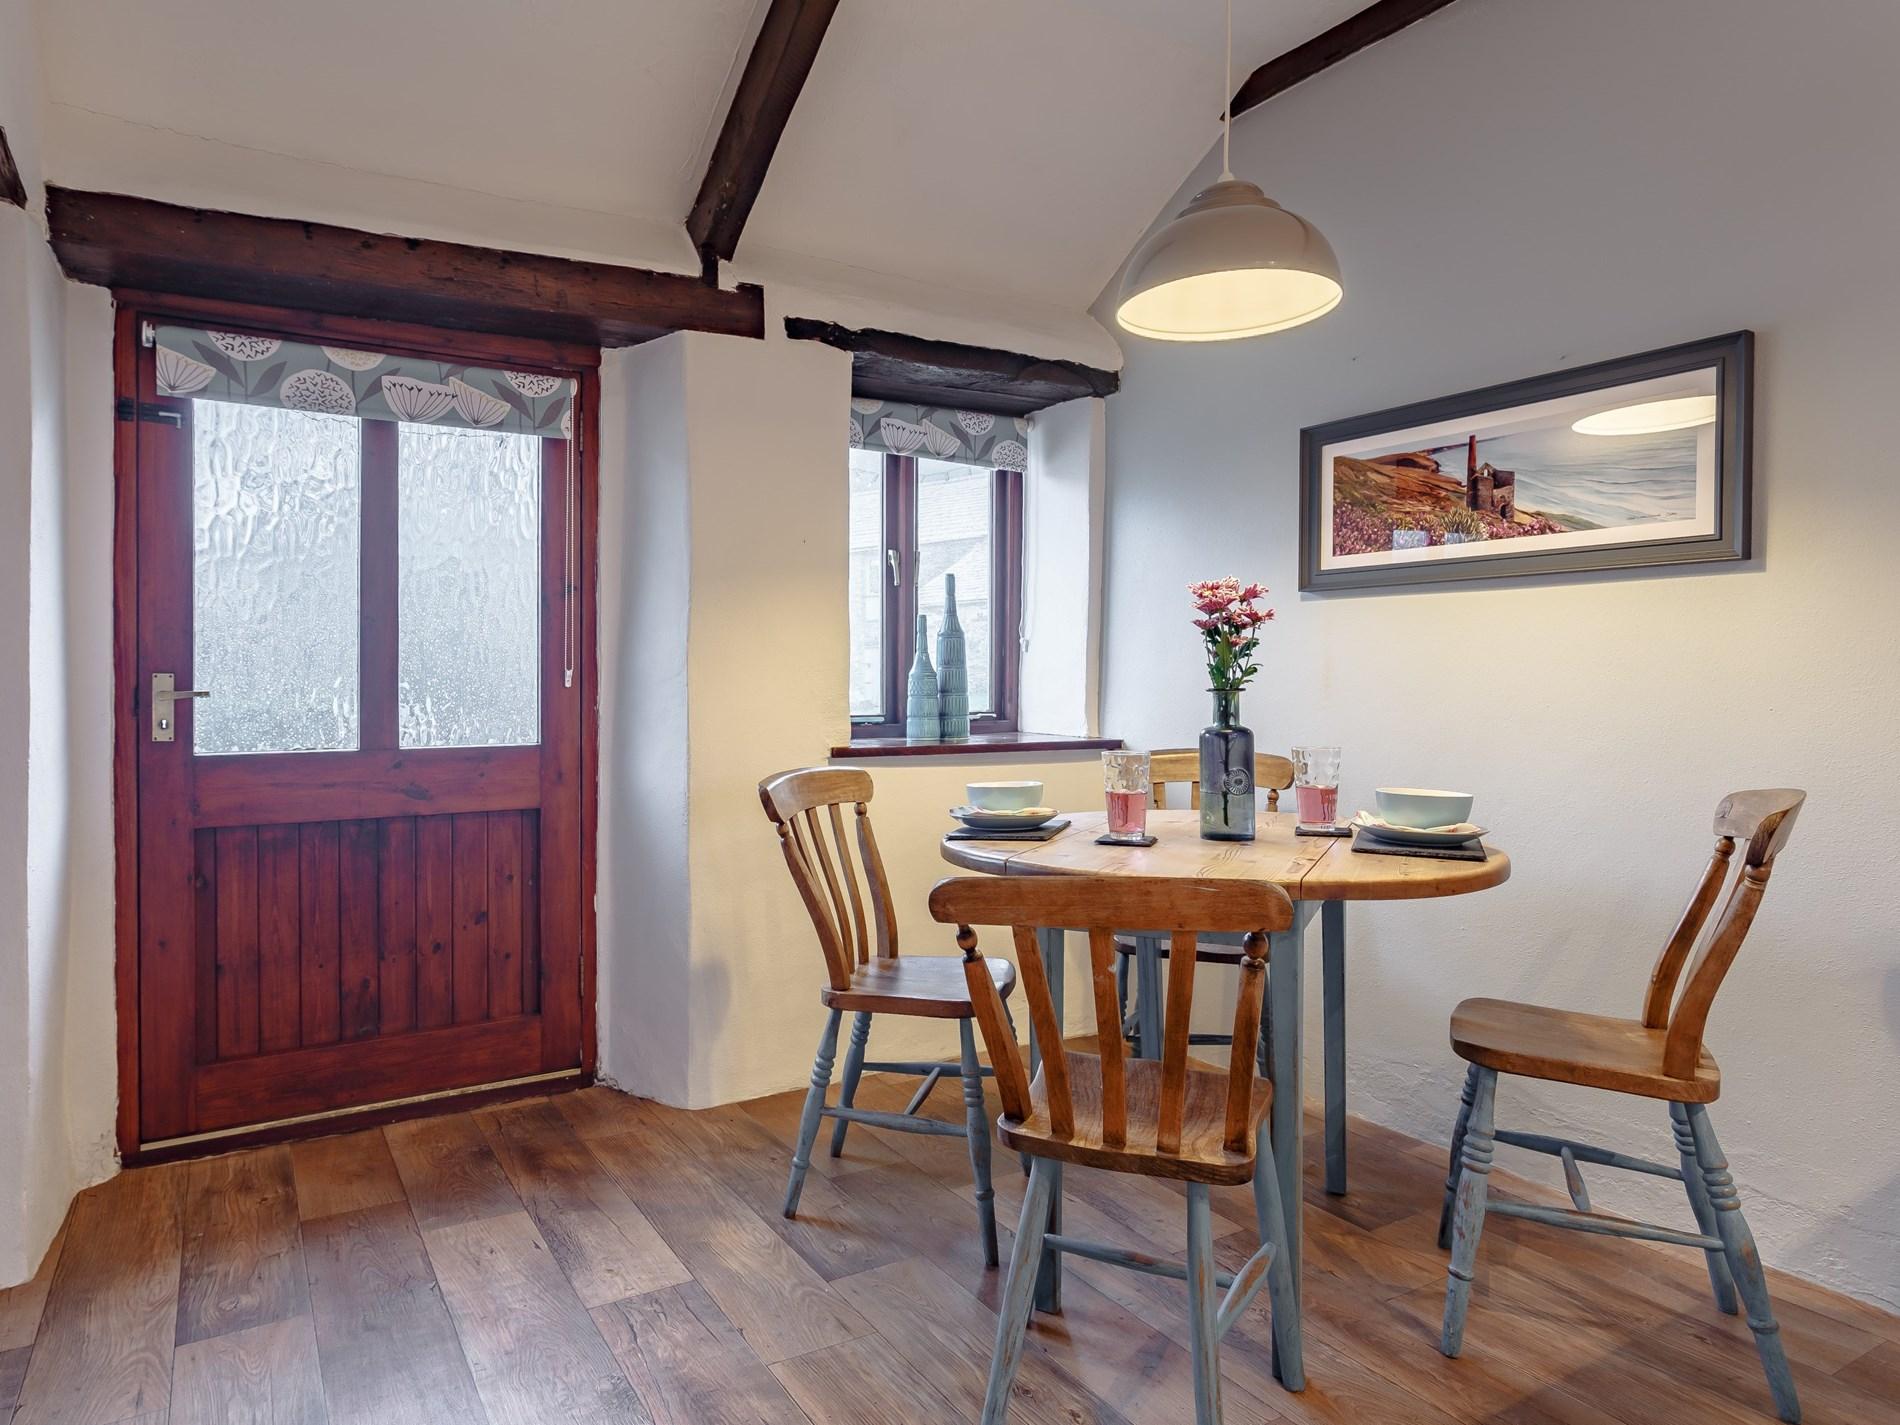 1 Bedroom Cottage in Tintagel, Cornwall